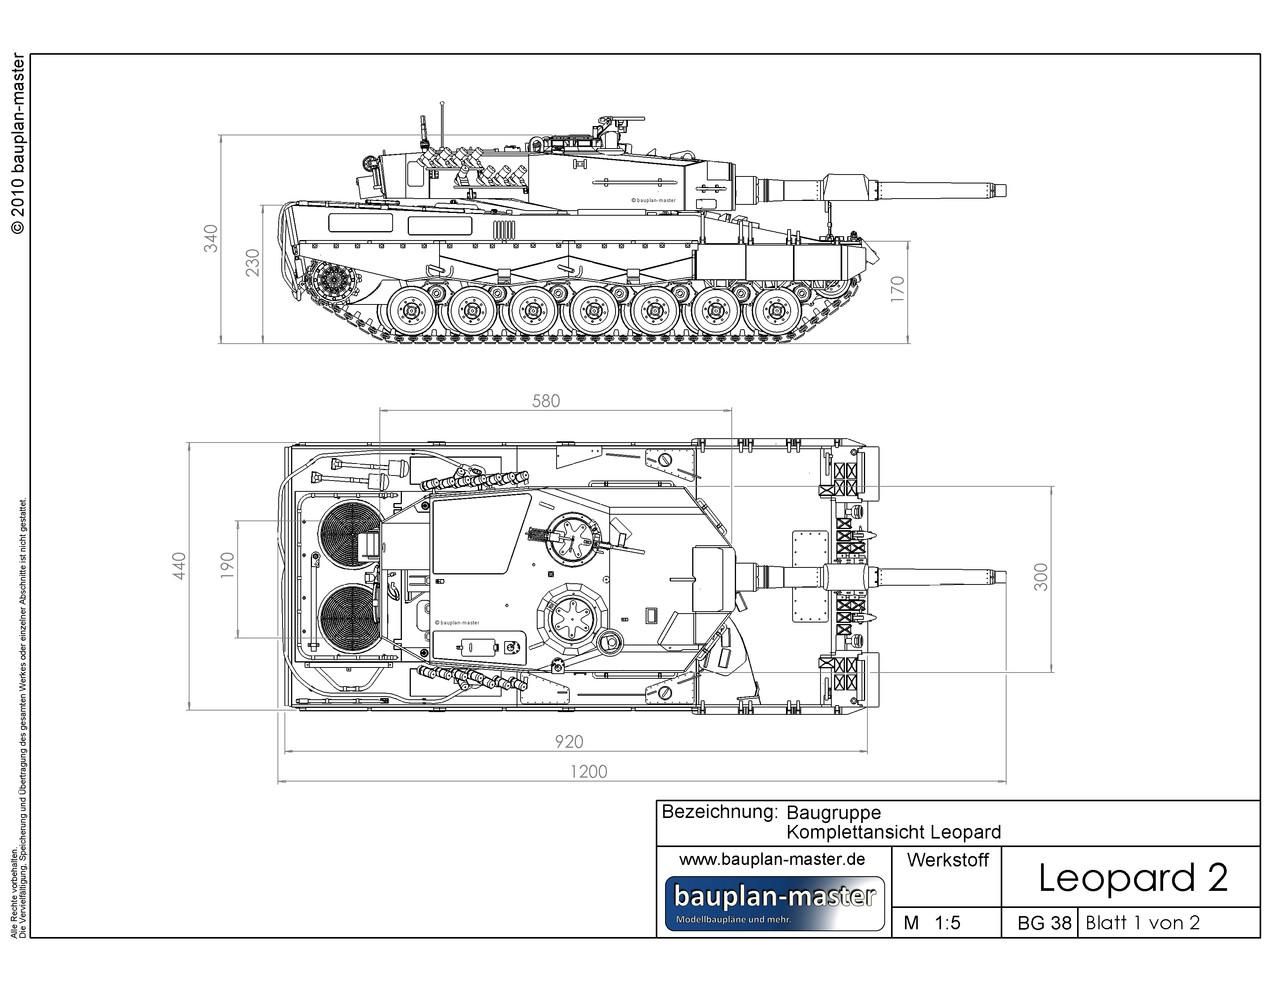 modellbauplan leopard 2a4 im ma stab 1 8 bauplan master. Black Bedroom Furniture Sets. Home Design Ideas